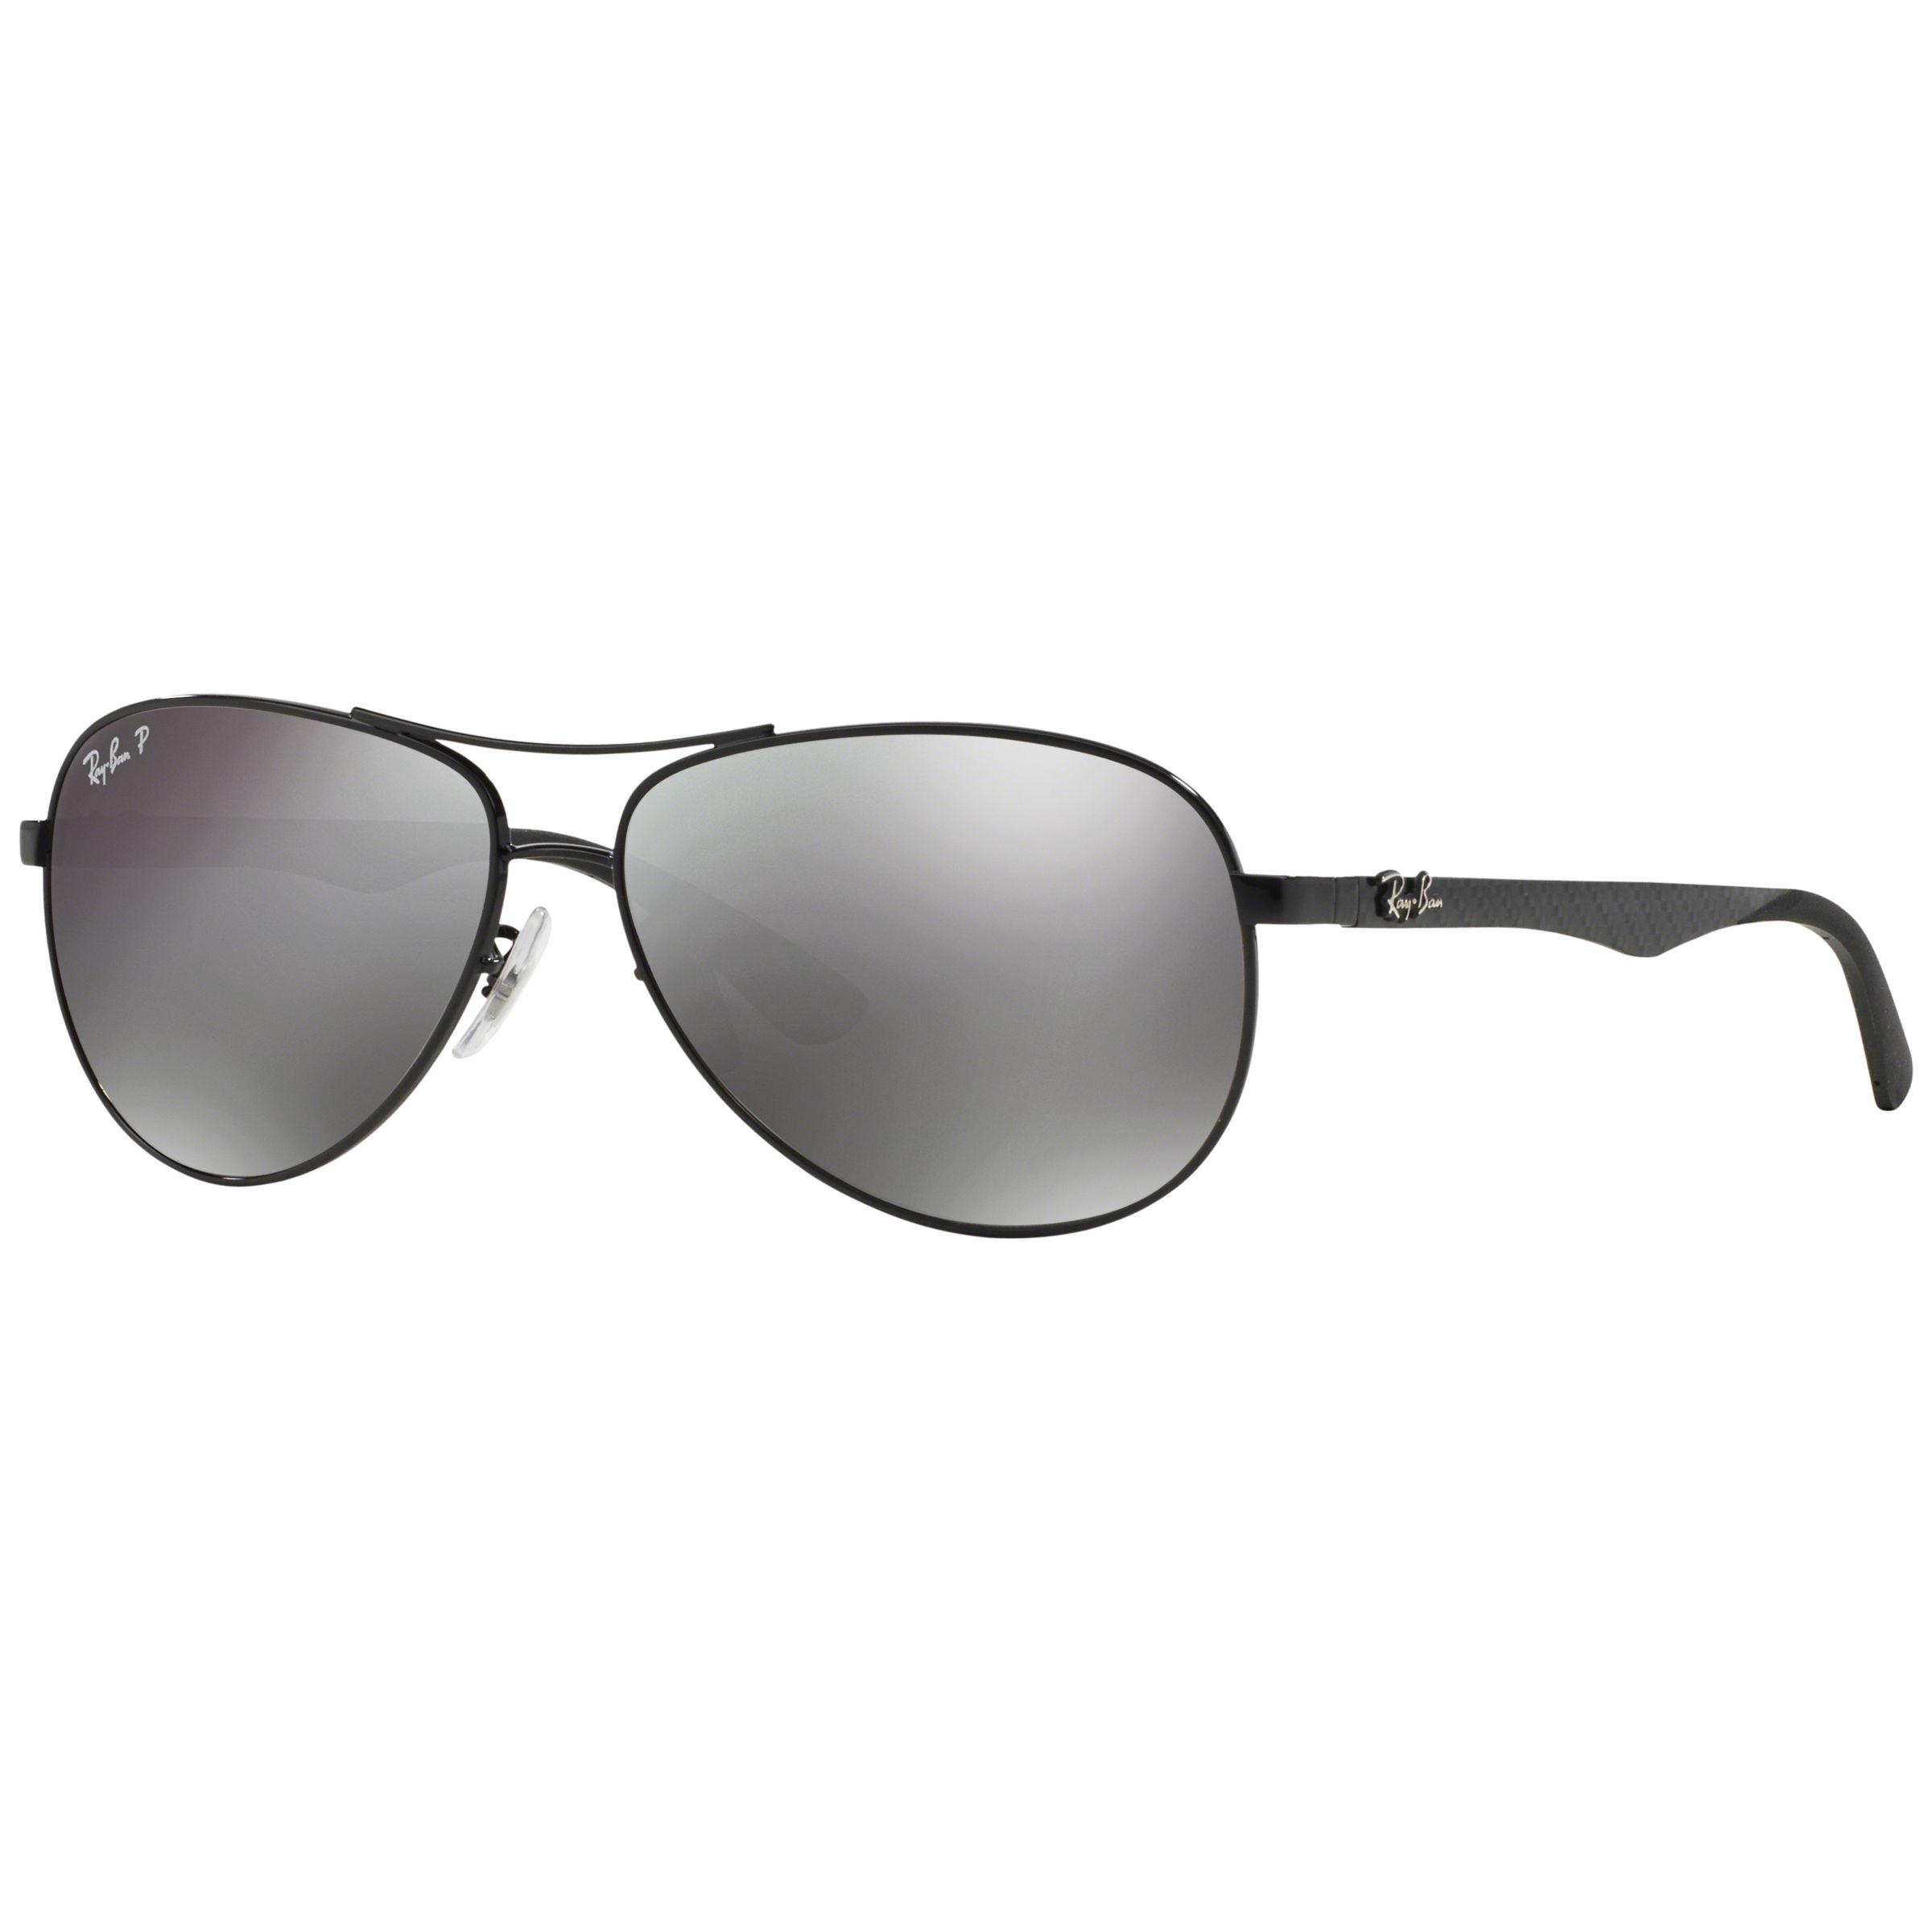 Ray-ban Ray-Ban RB8313 Polarised Carbon Fibre Pilot Sunglasses, Black